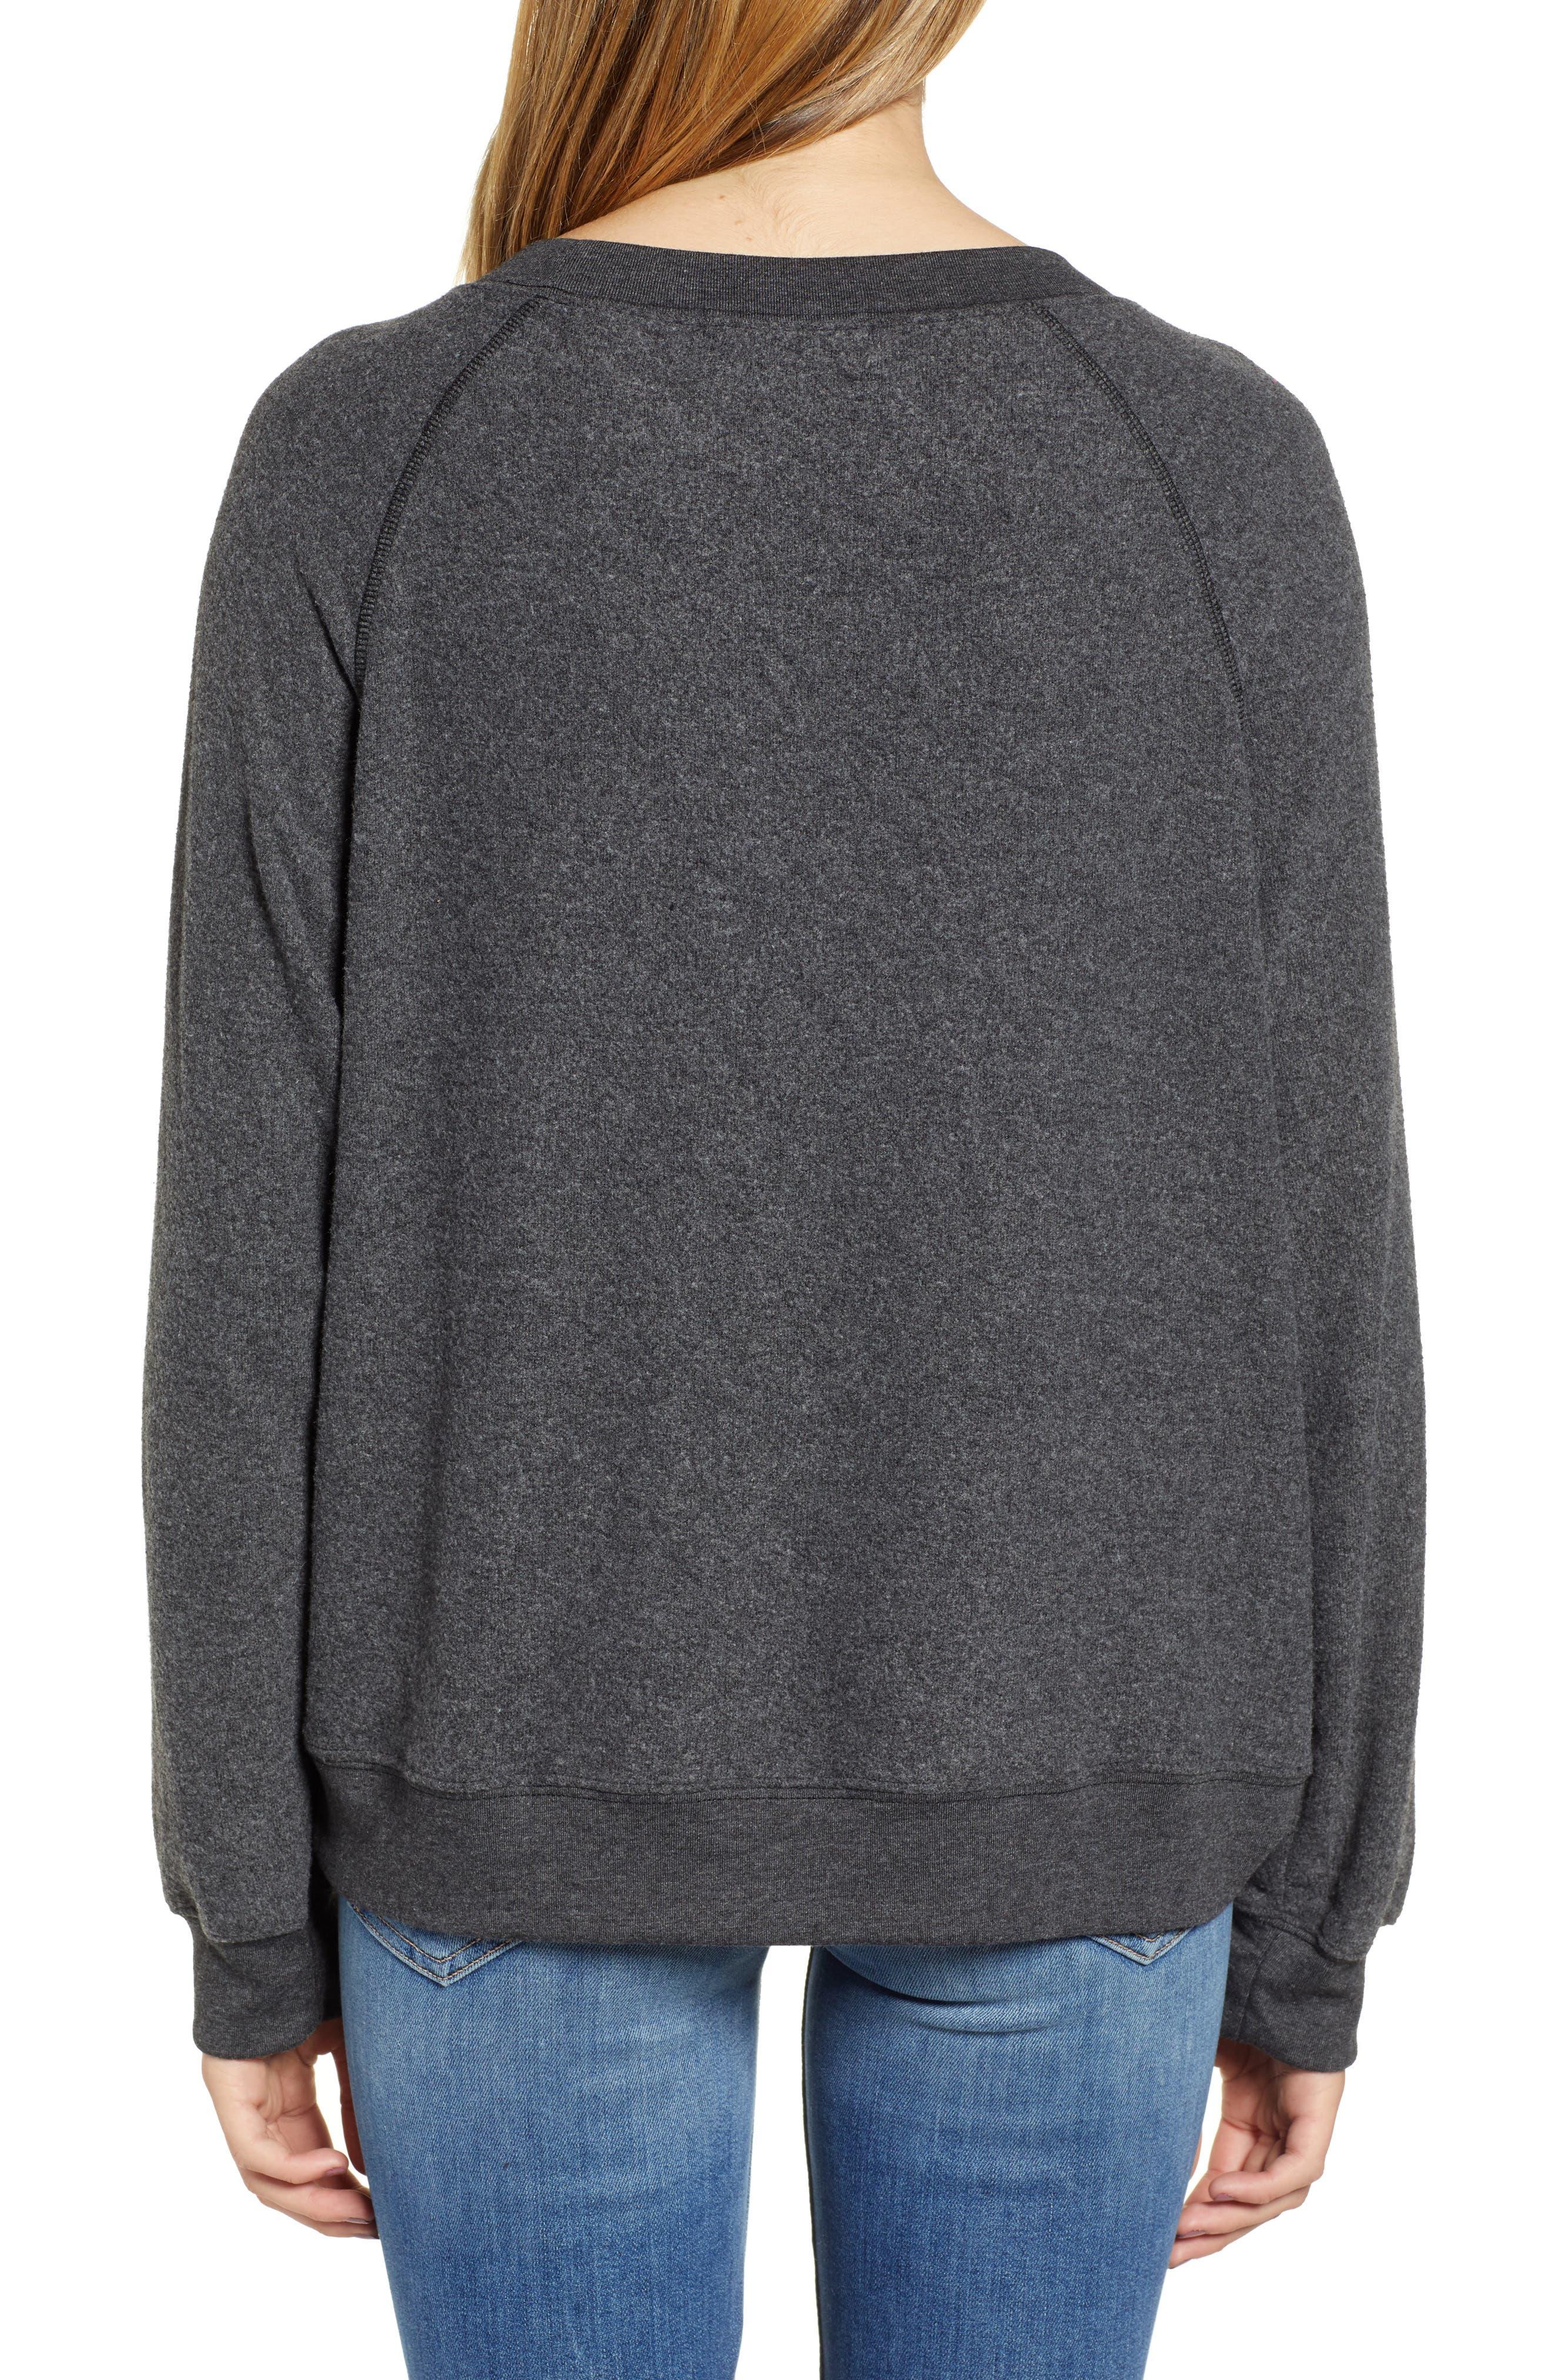 Sommers Papillion Sweatshirt,                             Alternate thumbnail 2, color,                             002